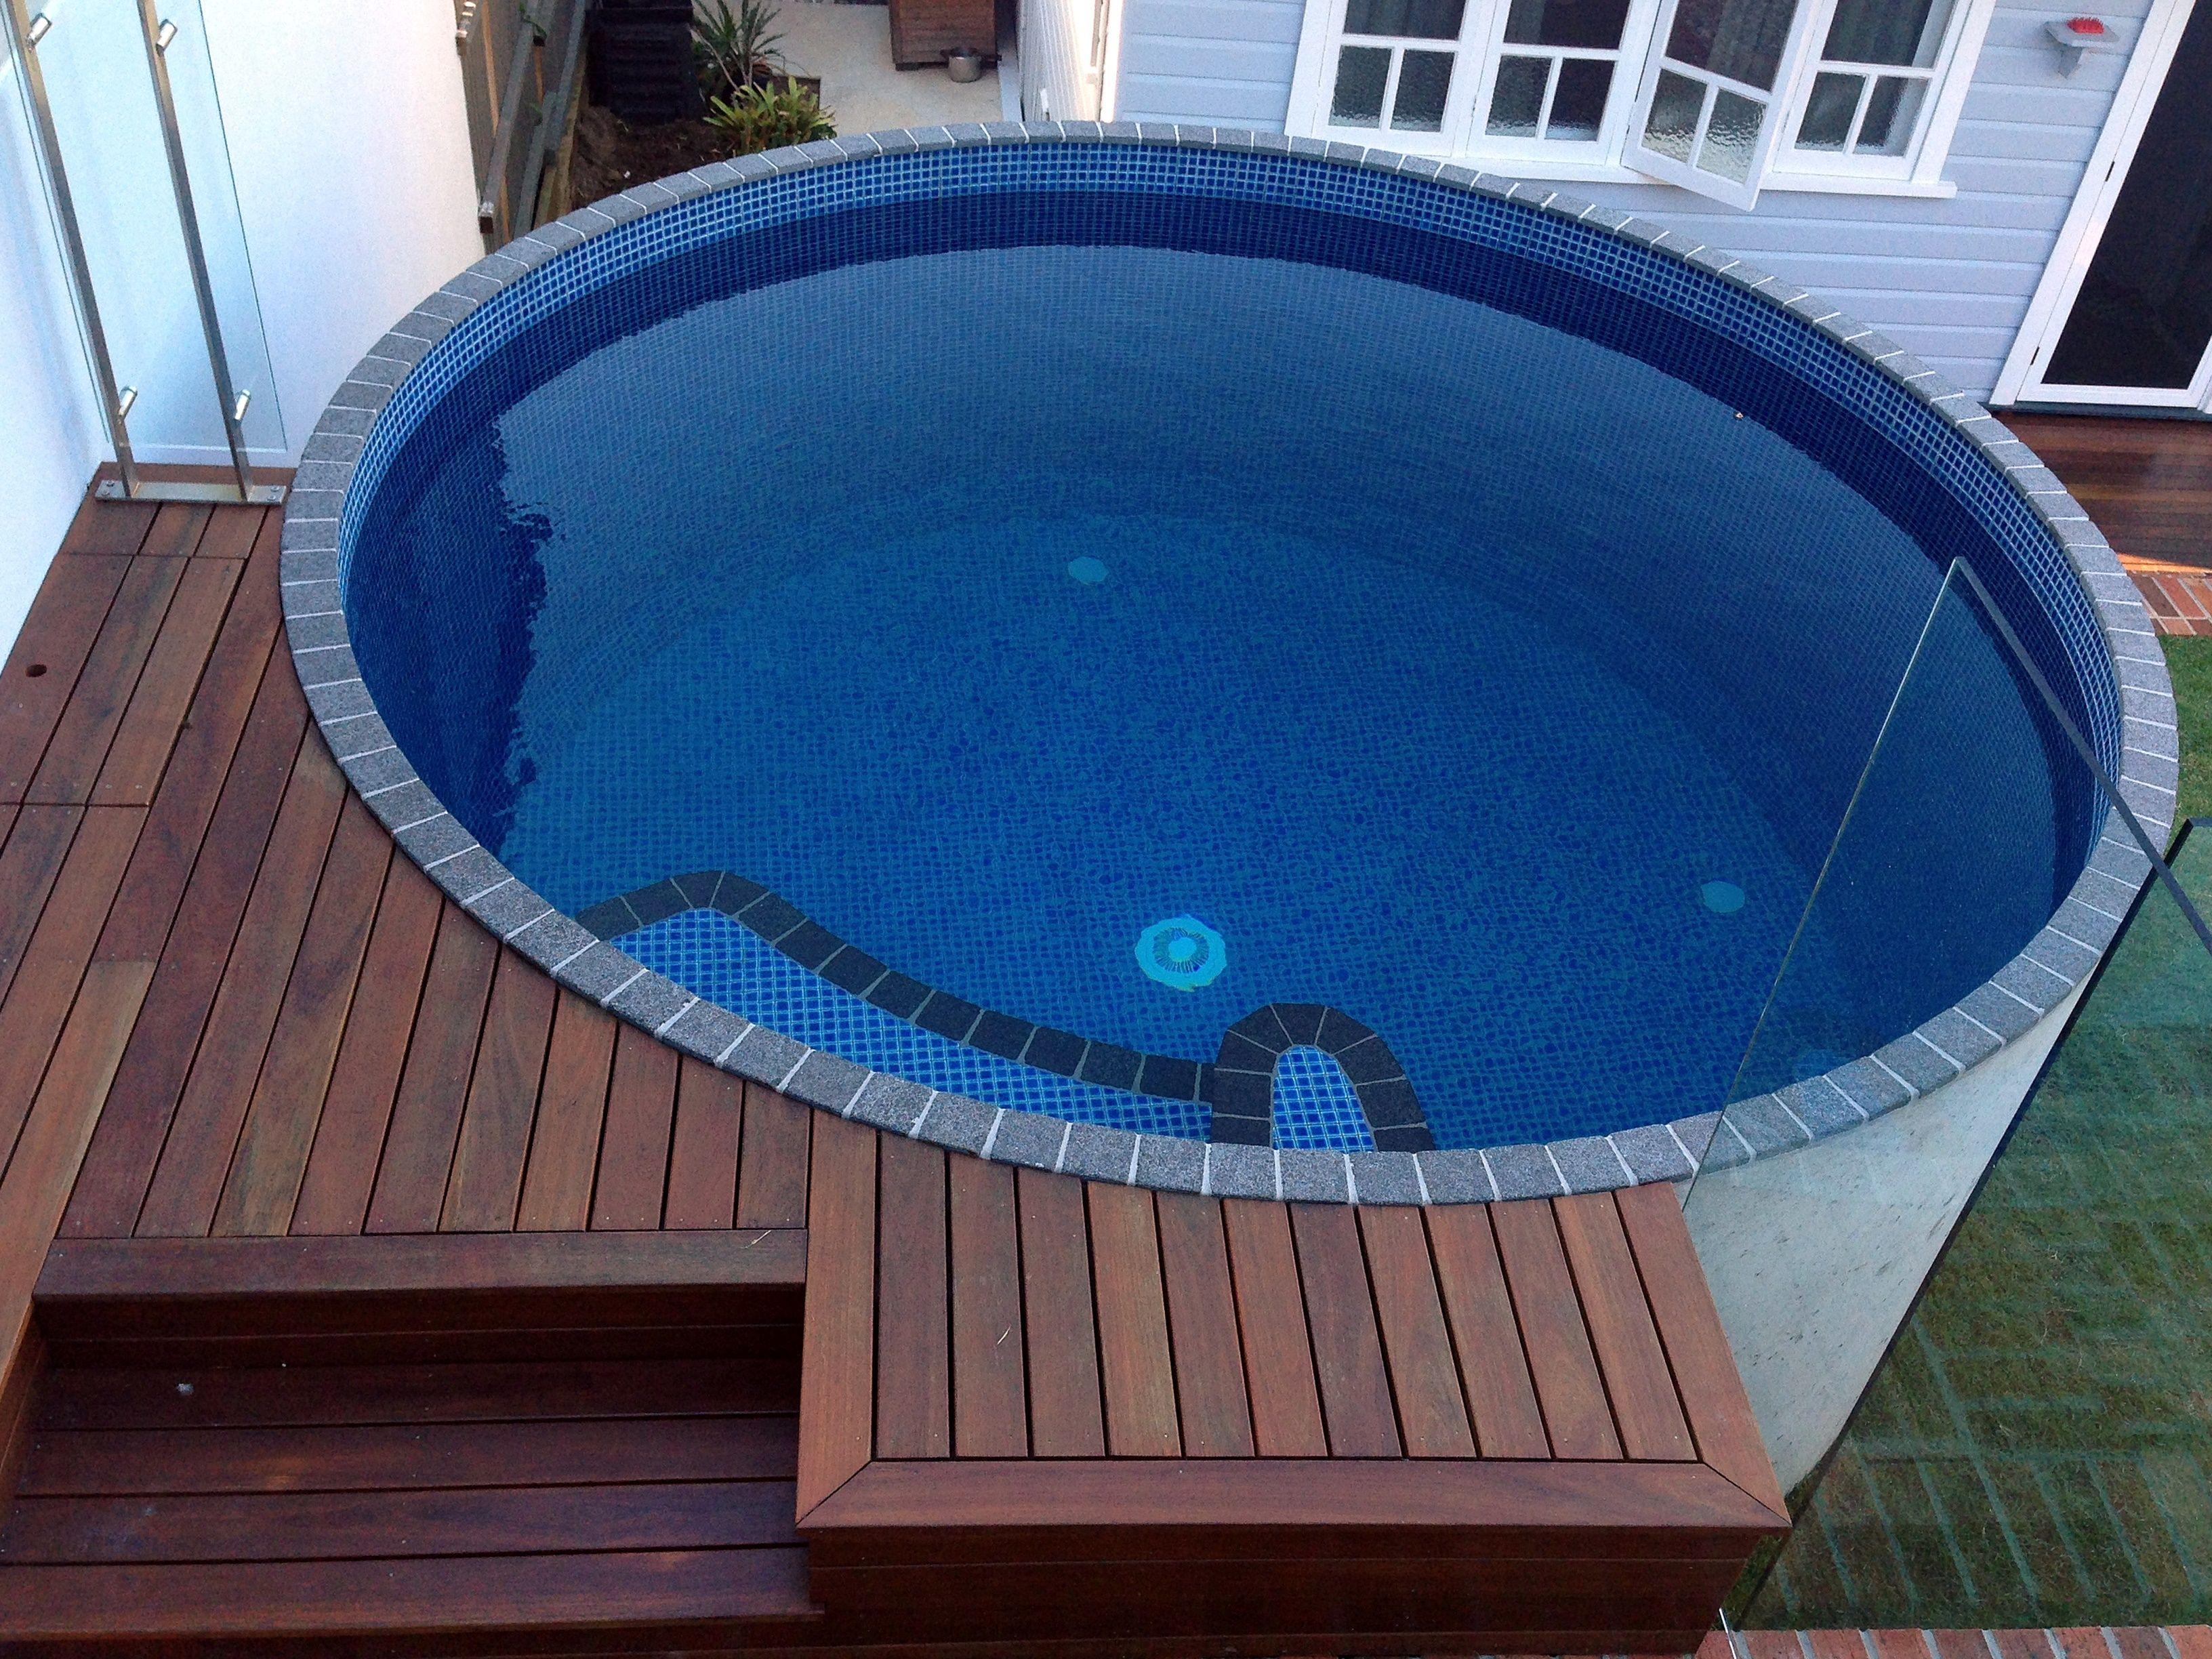 Brisbane Australian Plunge Pool | Inspirational Pool Designs ...